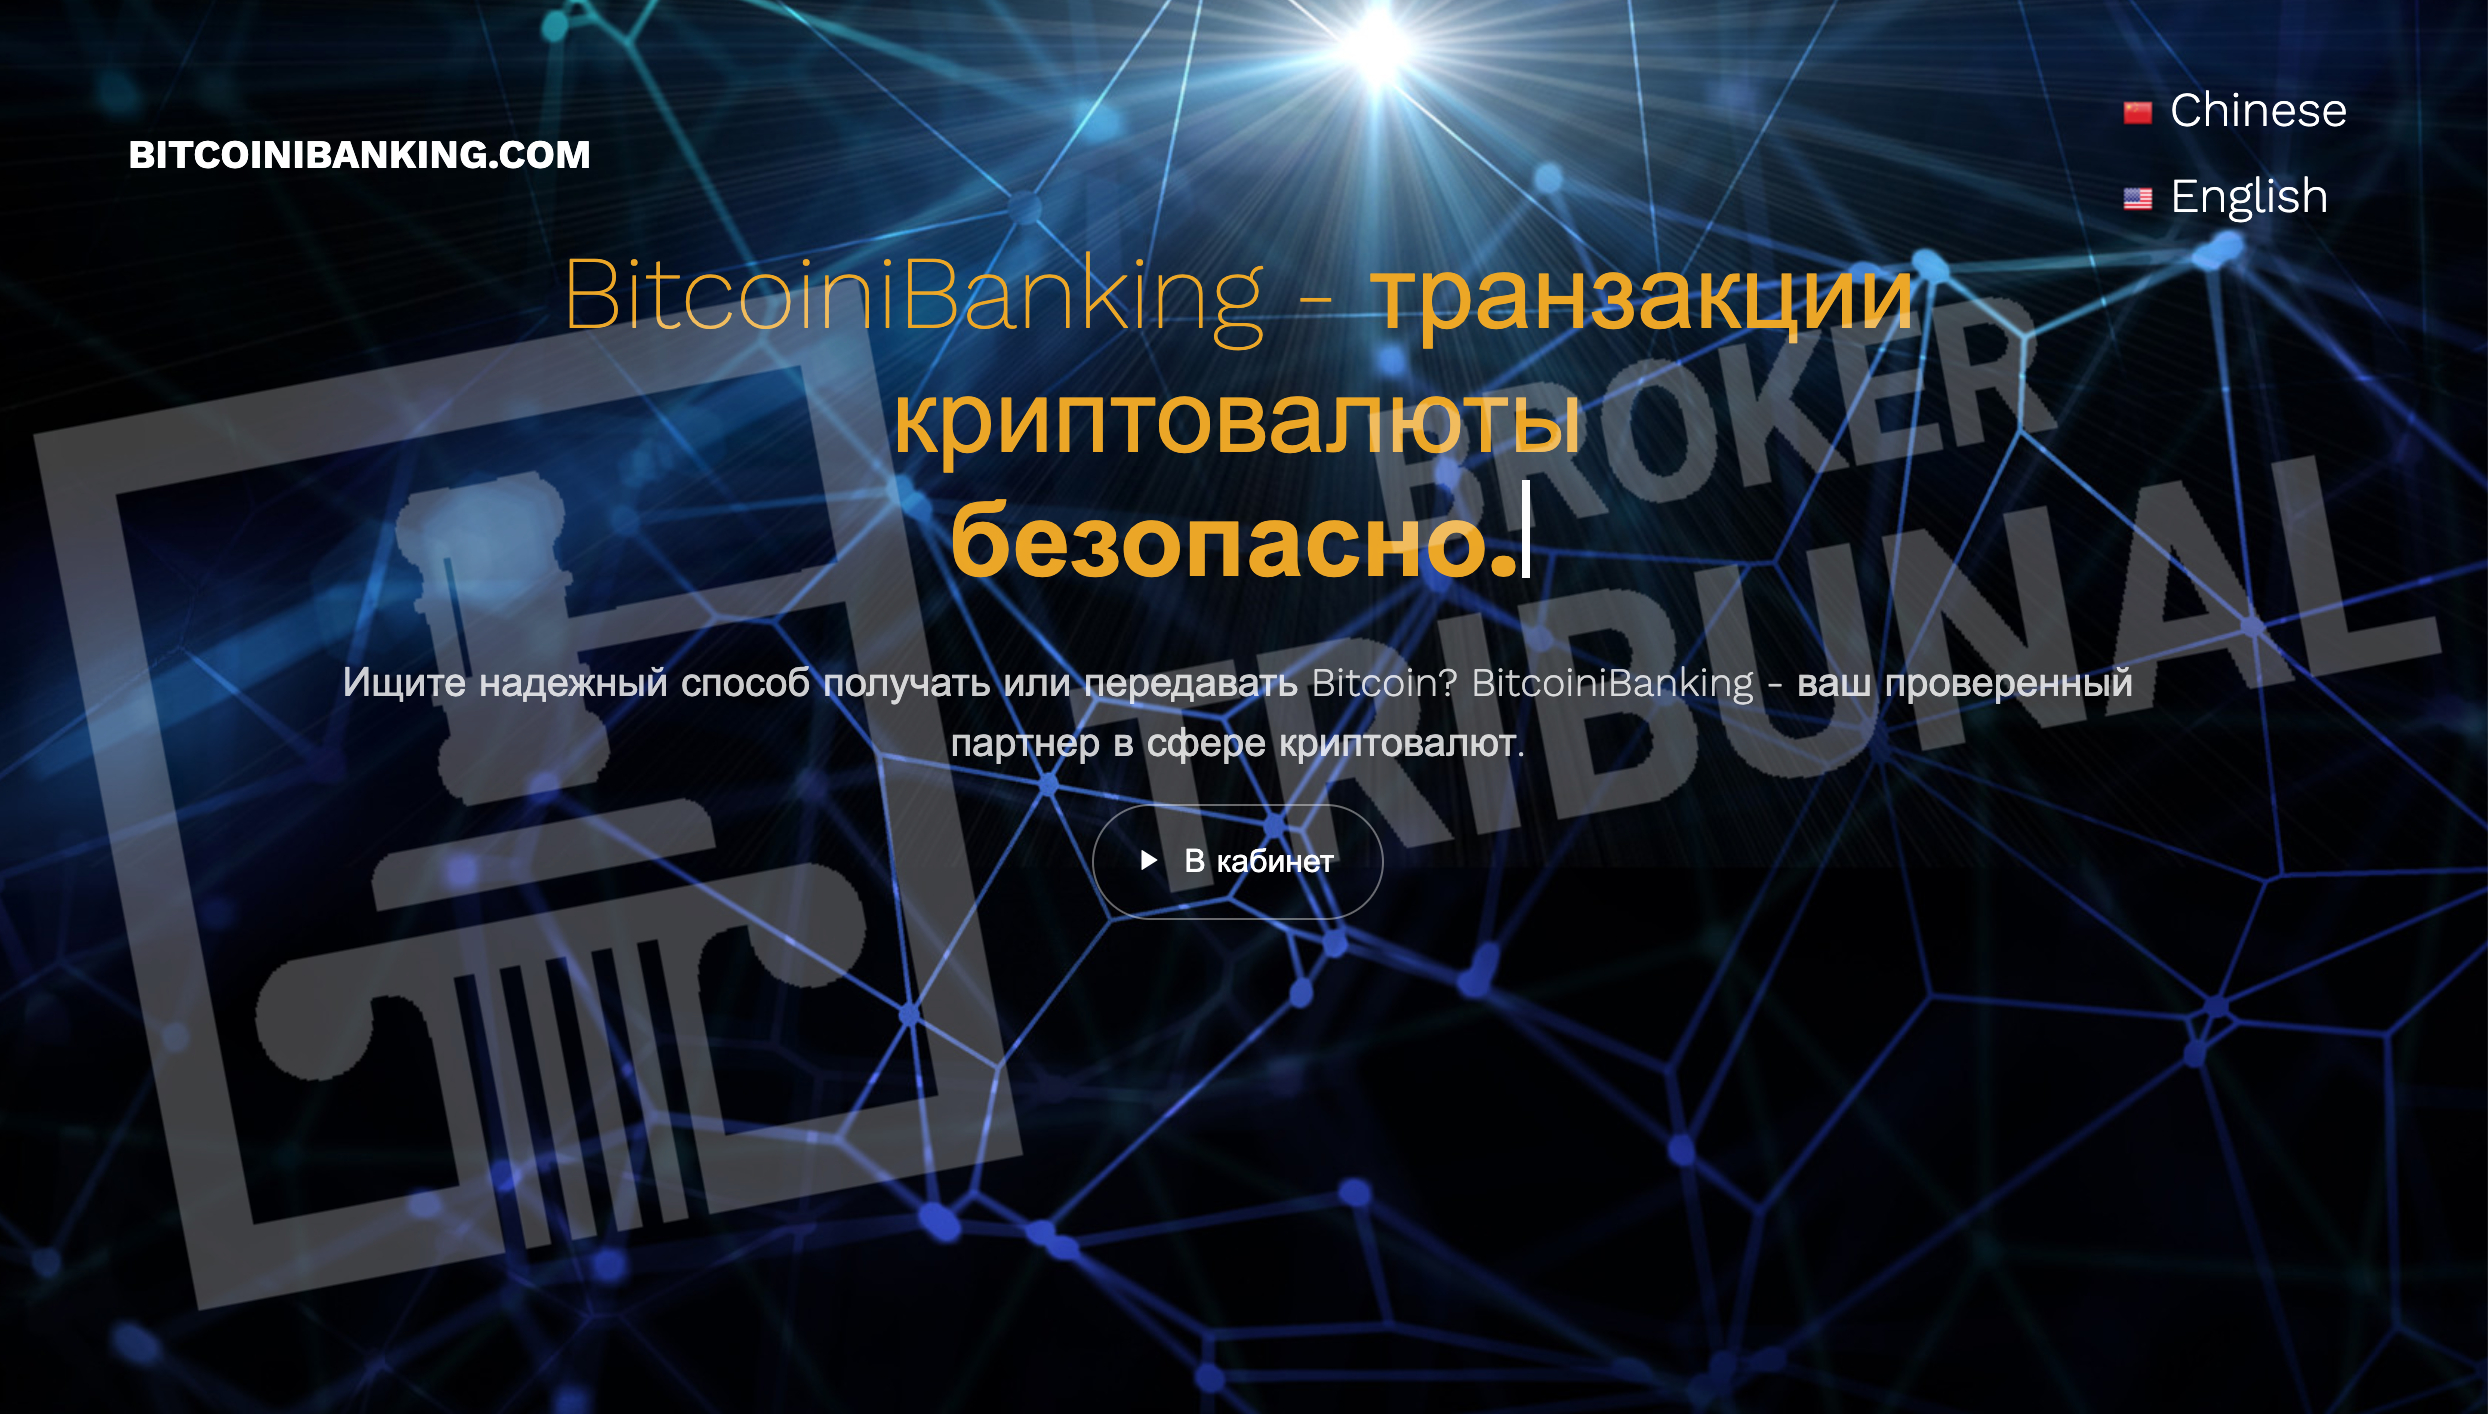 Биржа Huobi Global поддержала проект BitcoiniBanking